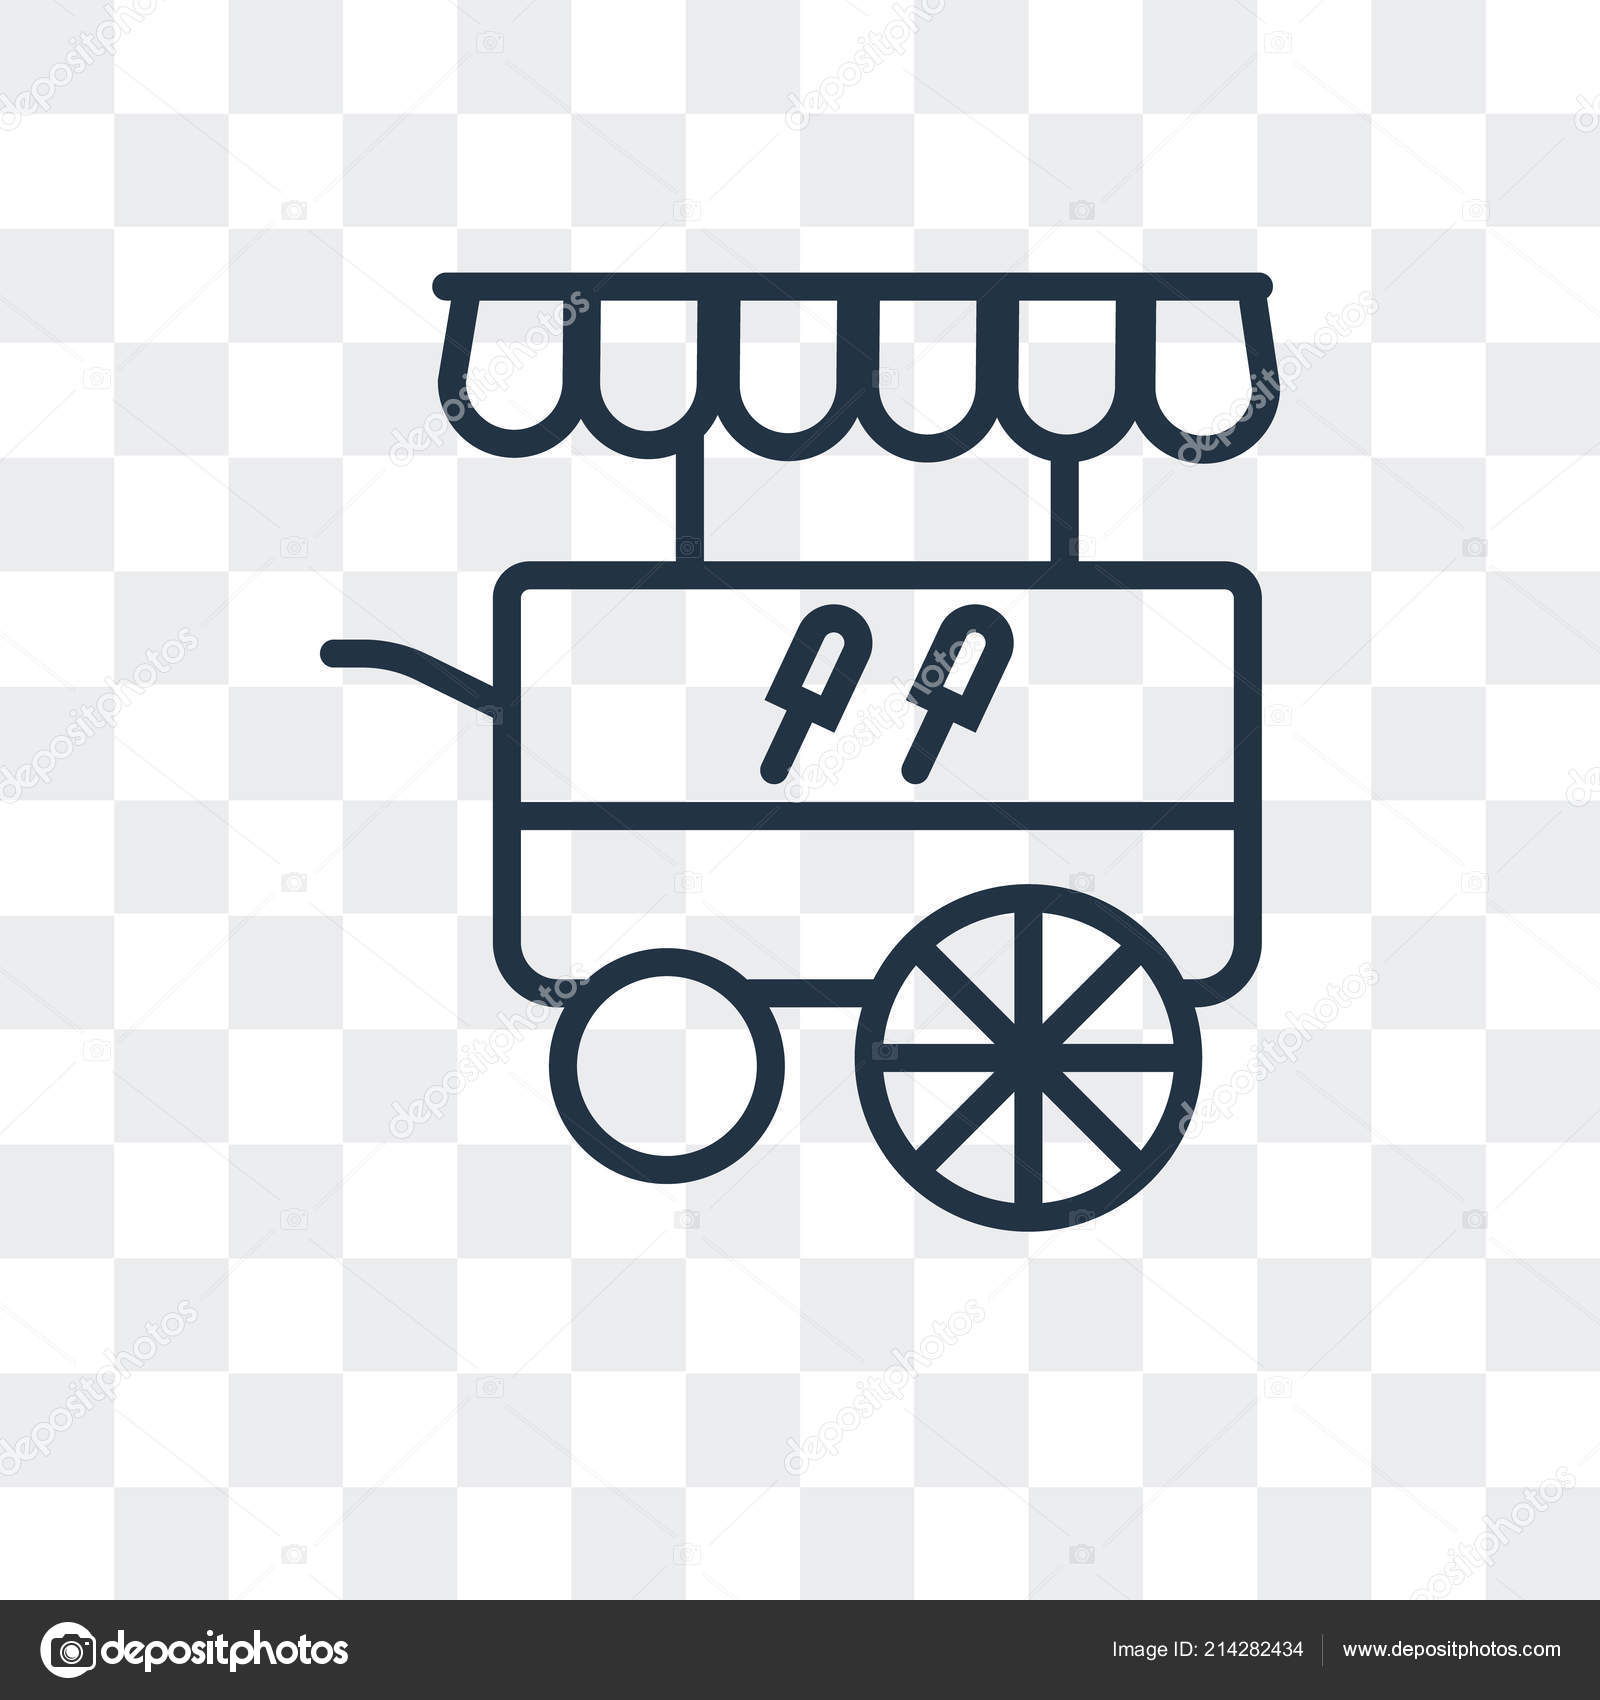 ice cream truck vector icon isolated on transparent background ice cream truck logo design stock vector c bestvectorstock 214282434 https depositphotos com 214282434 stock illustration ice cream truck vector icon html